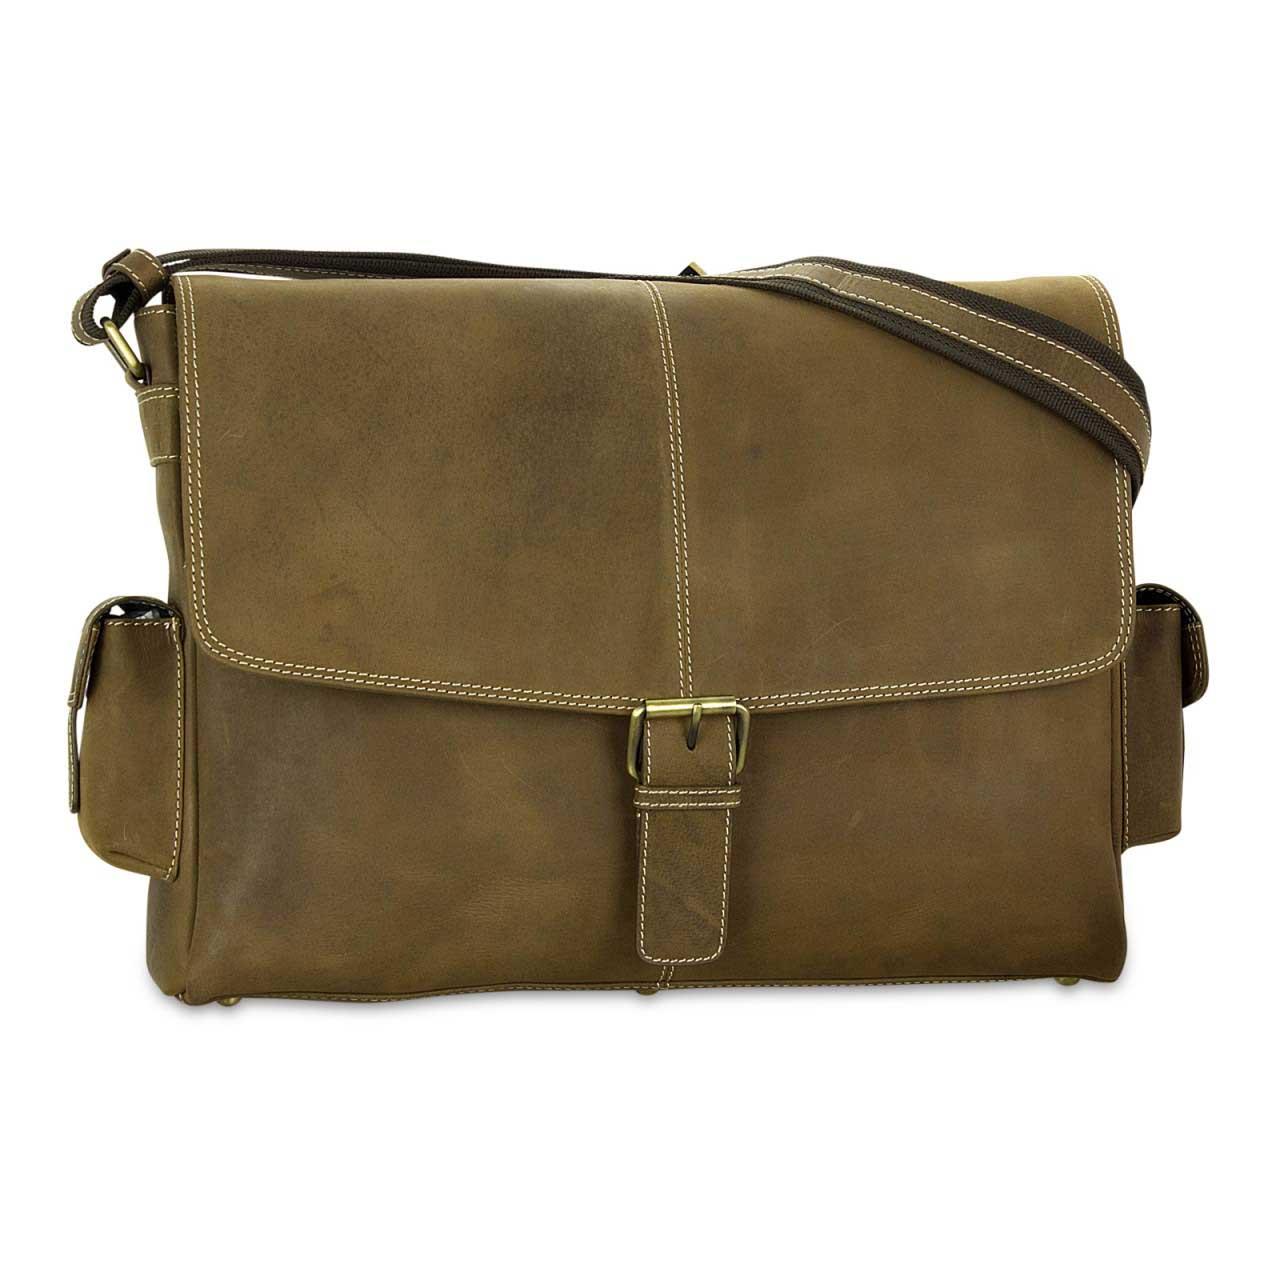 STILORD Ledertasche Umhängetasche 15.6 Zoll Laptoptasche aus echtem Büffel-Leder braun  - Bild 2